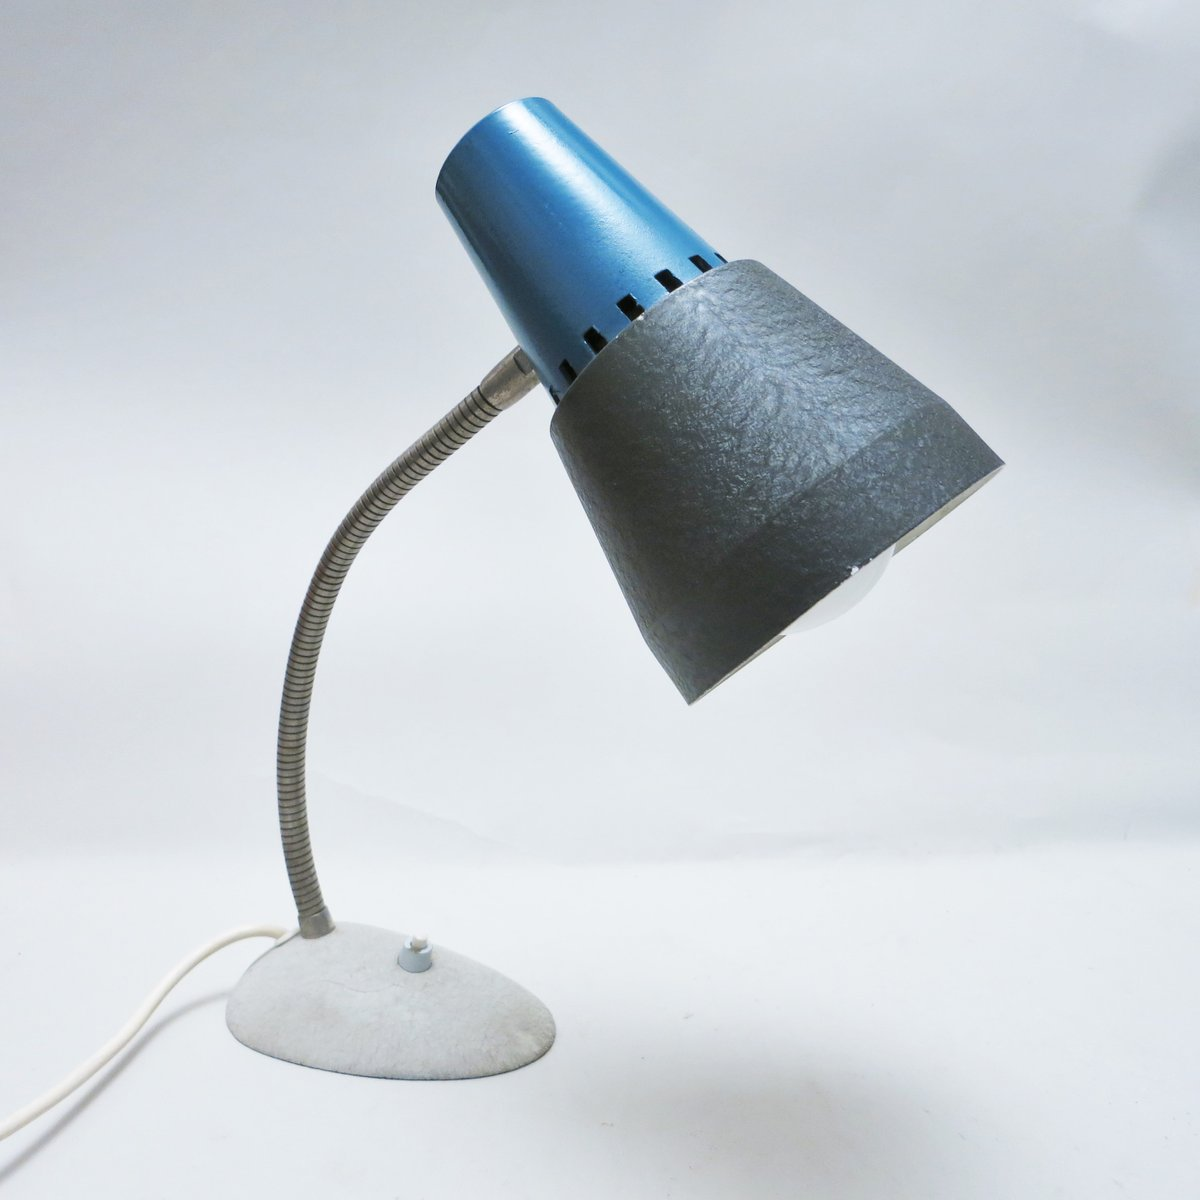 Vintage Small Desk Lamp, 1960s